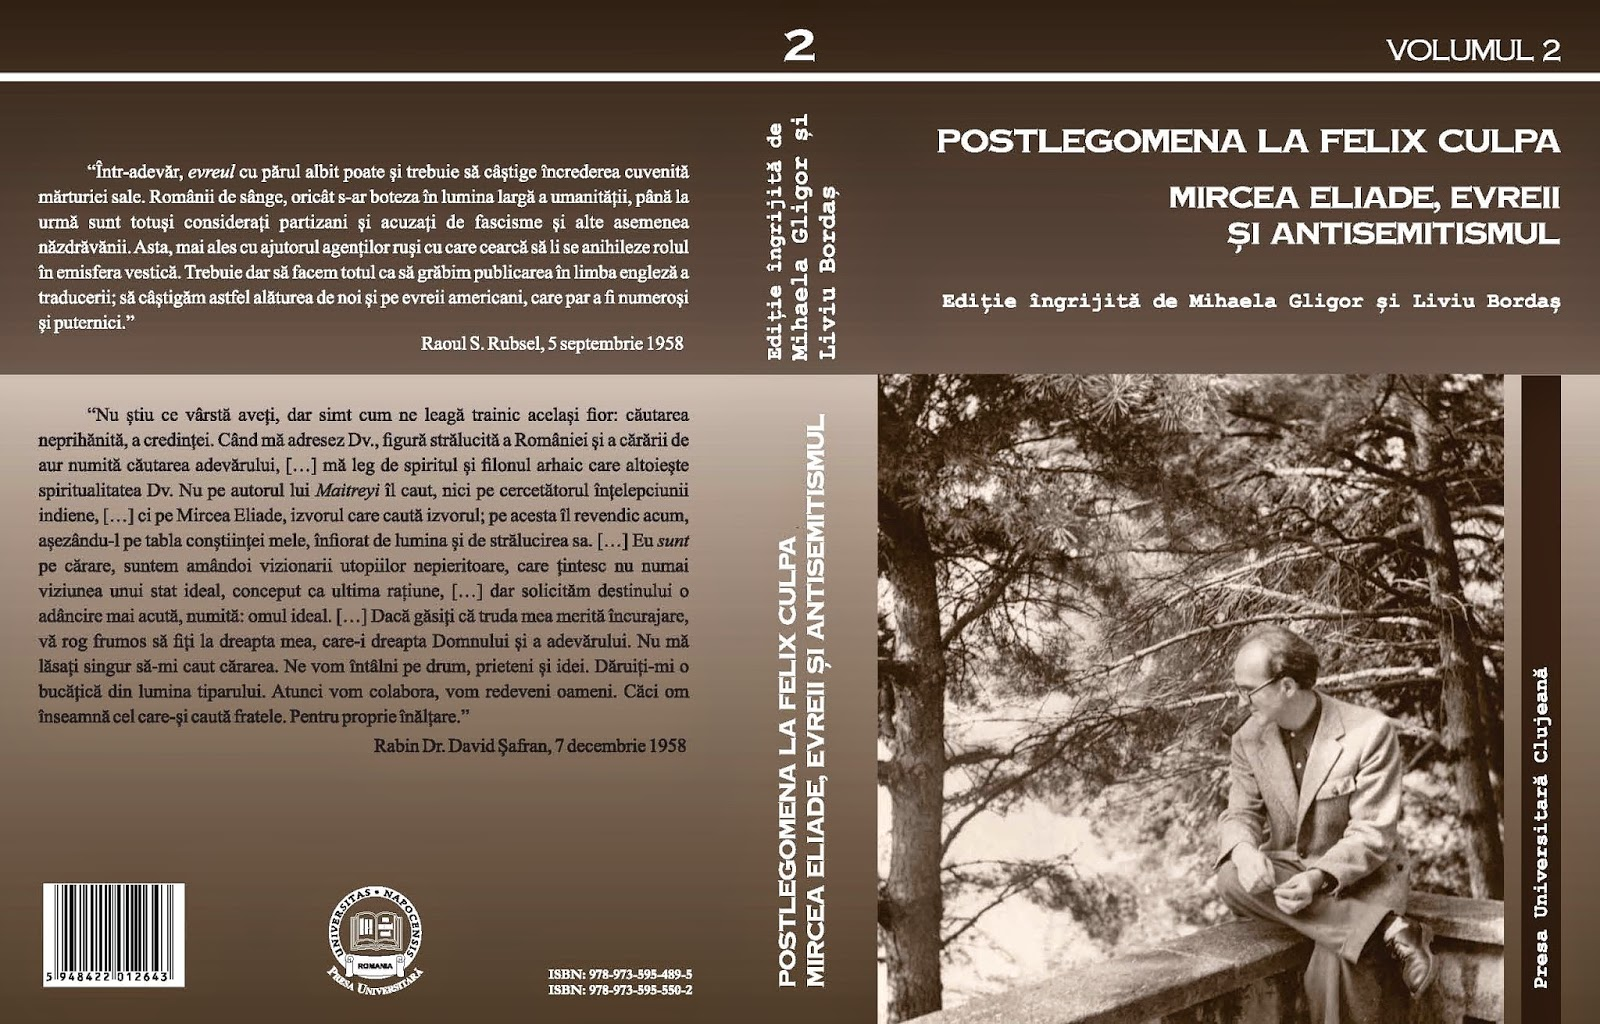 "Postlegomena la ""felix culpa"". Mircea Eliade, evreii şi antisemitismul vol. 2"